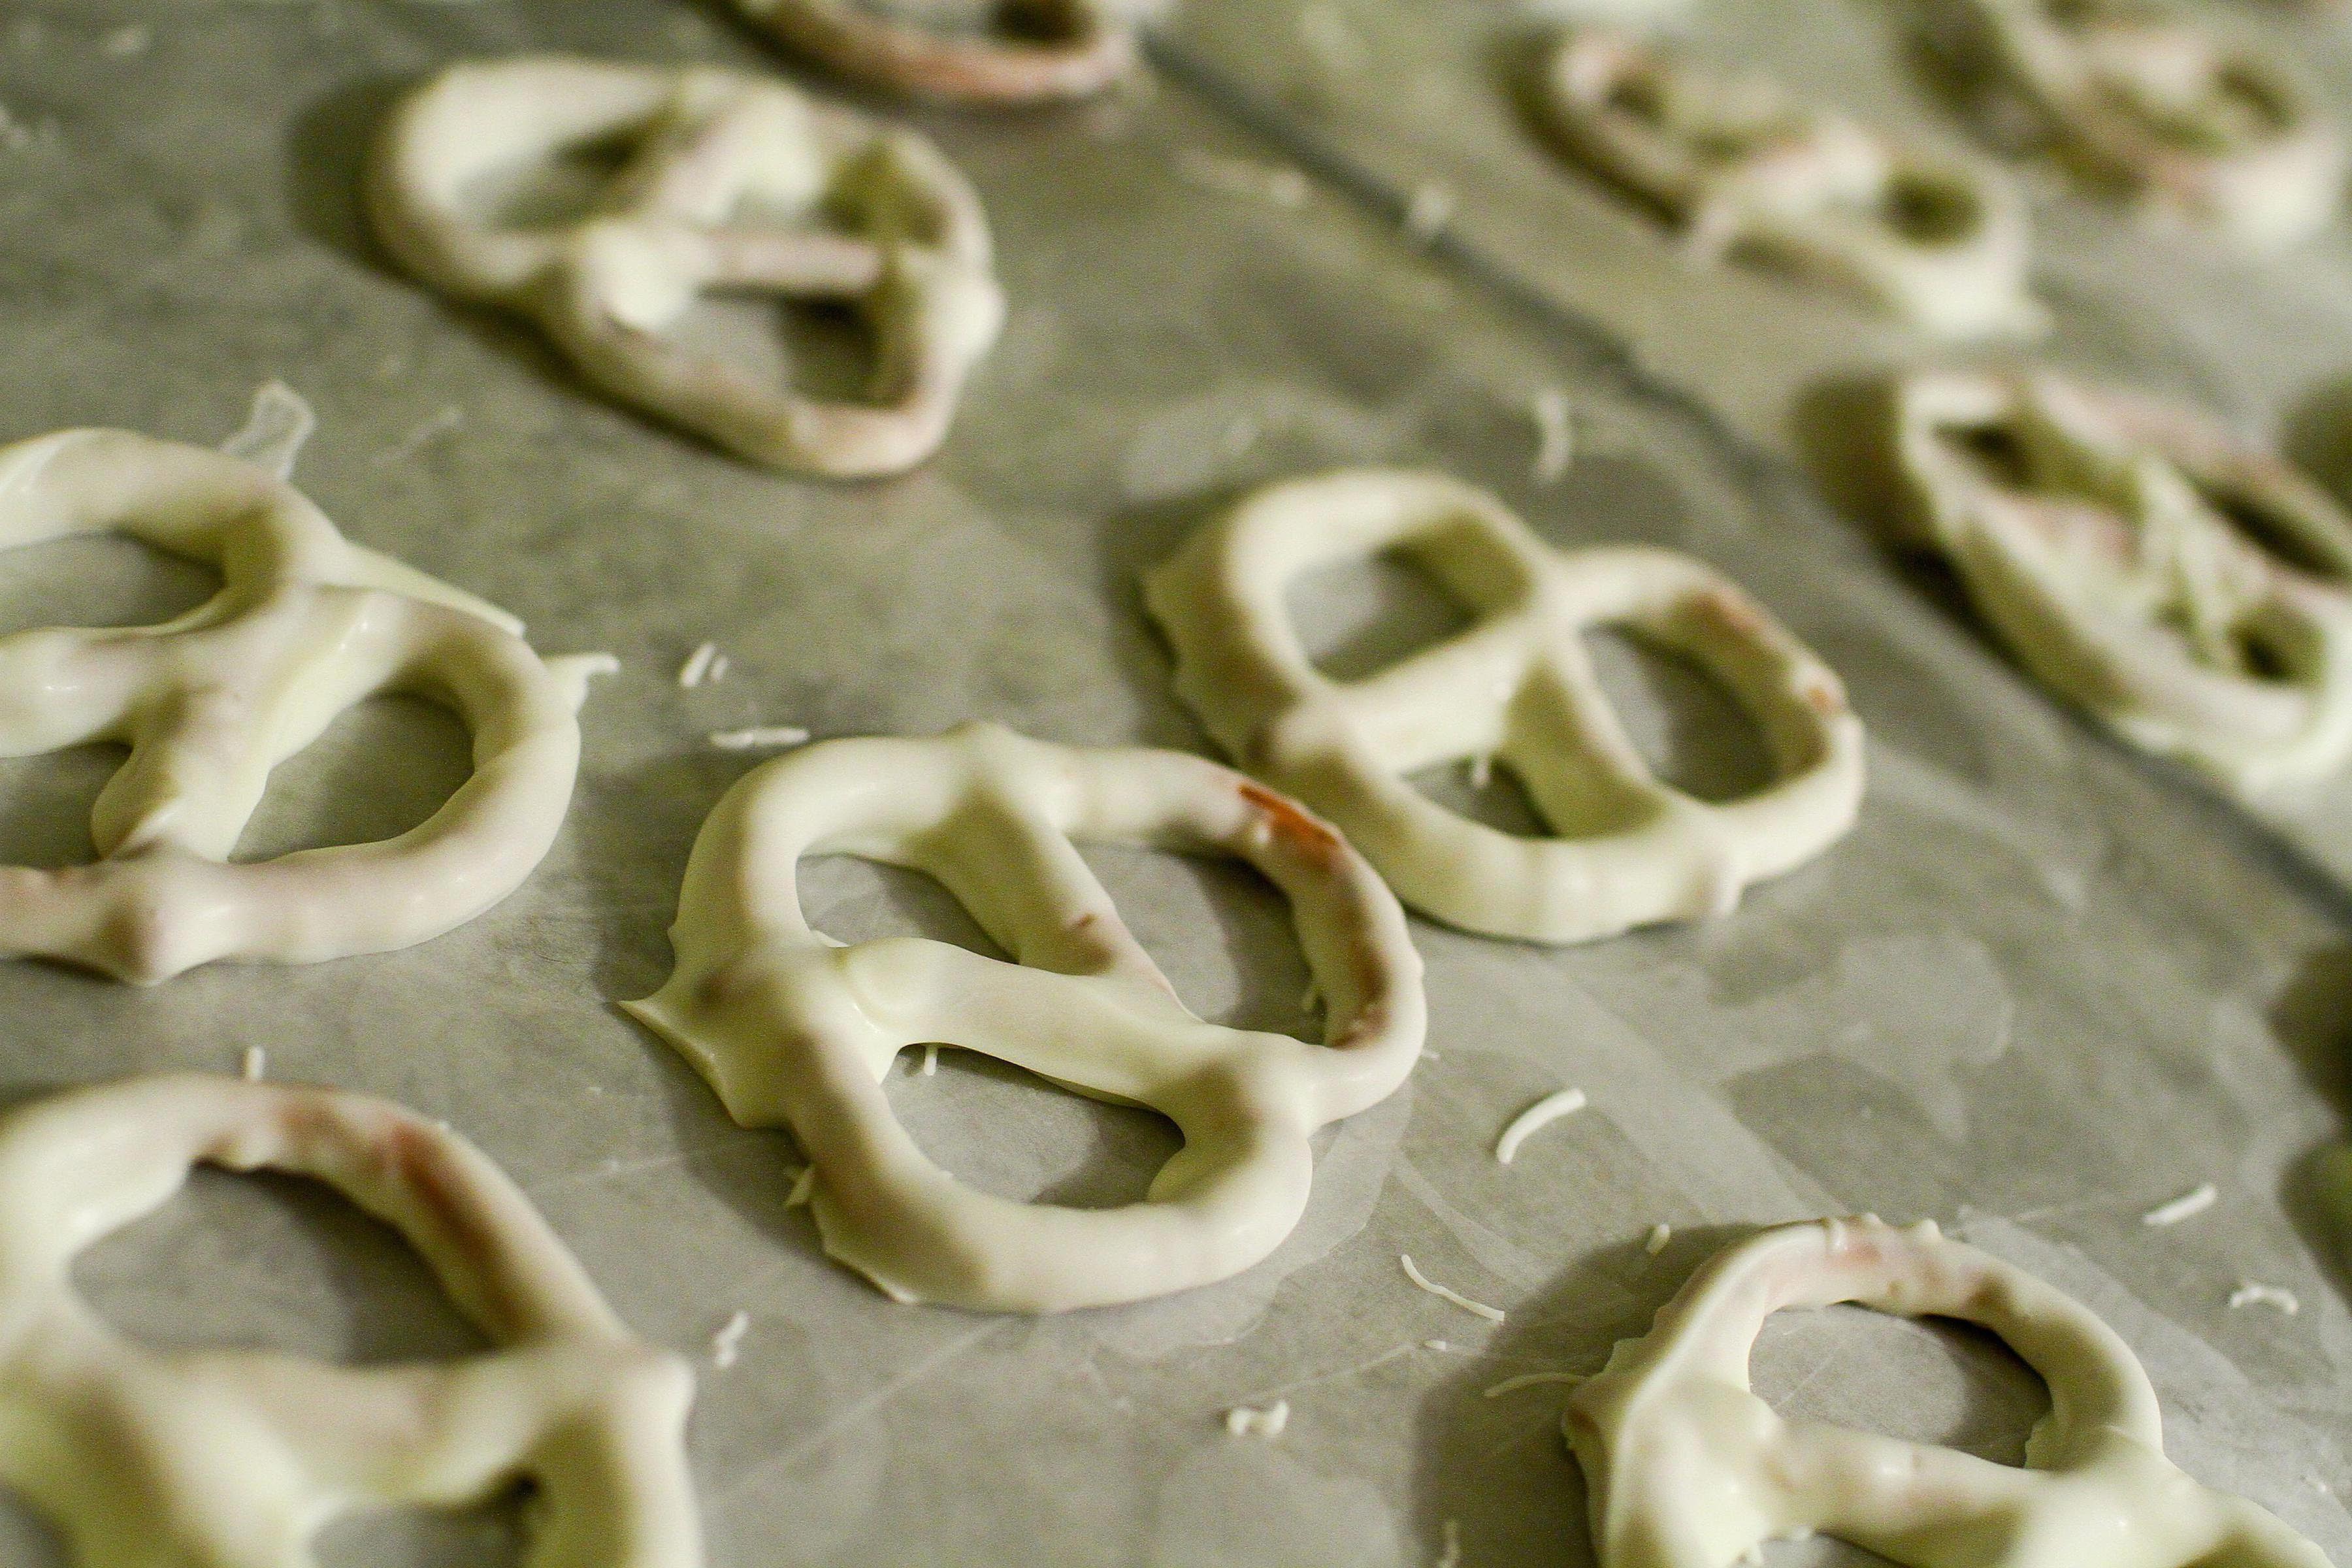 White Chocolate Covered Pretzels Recipe